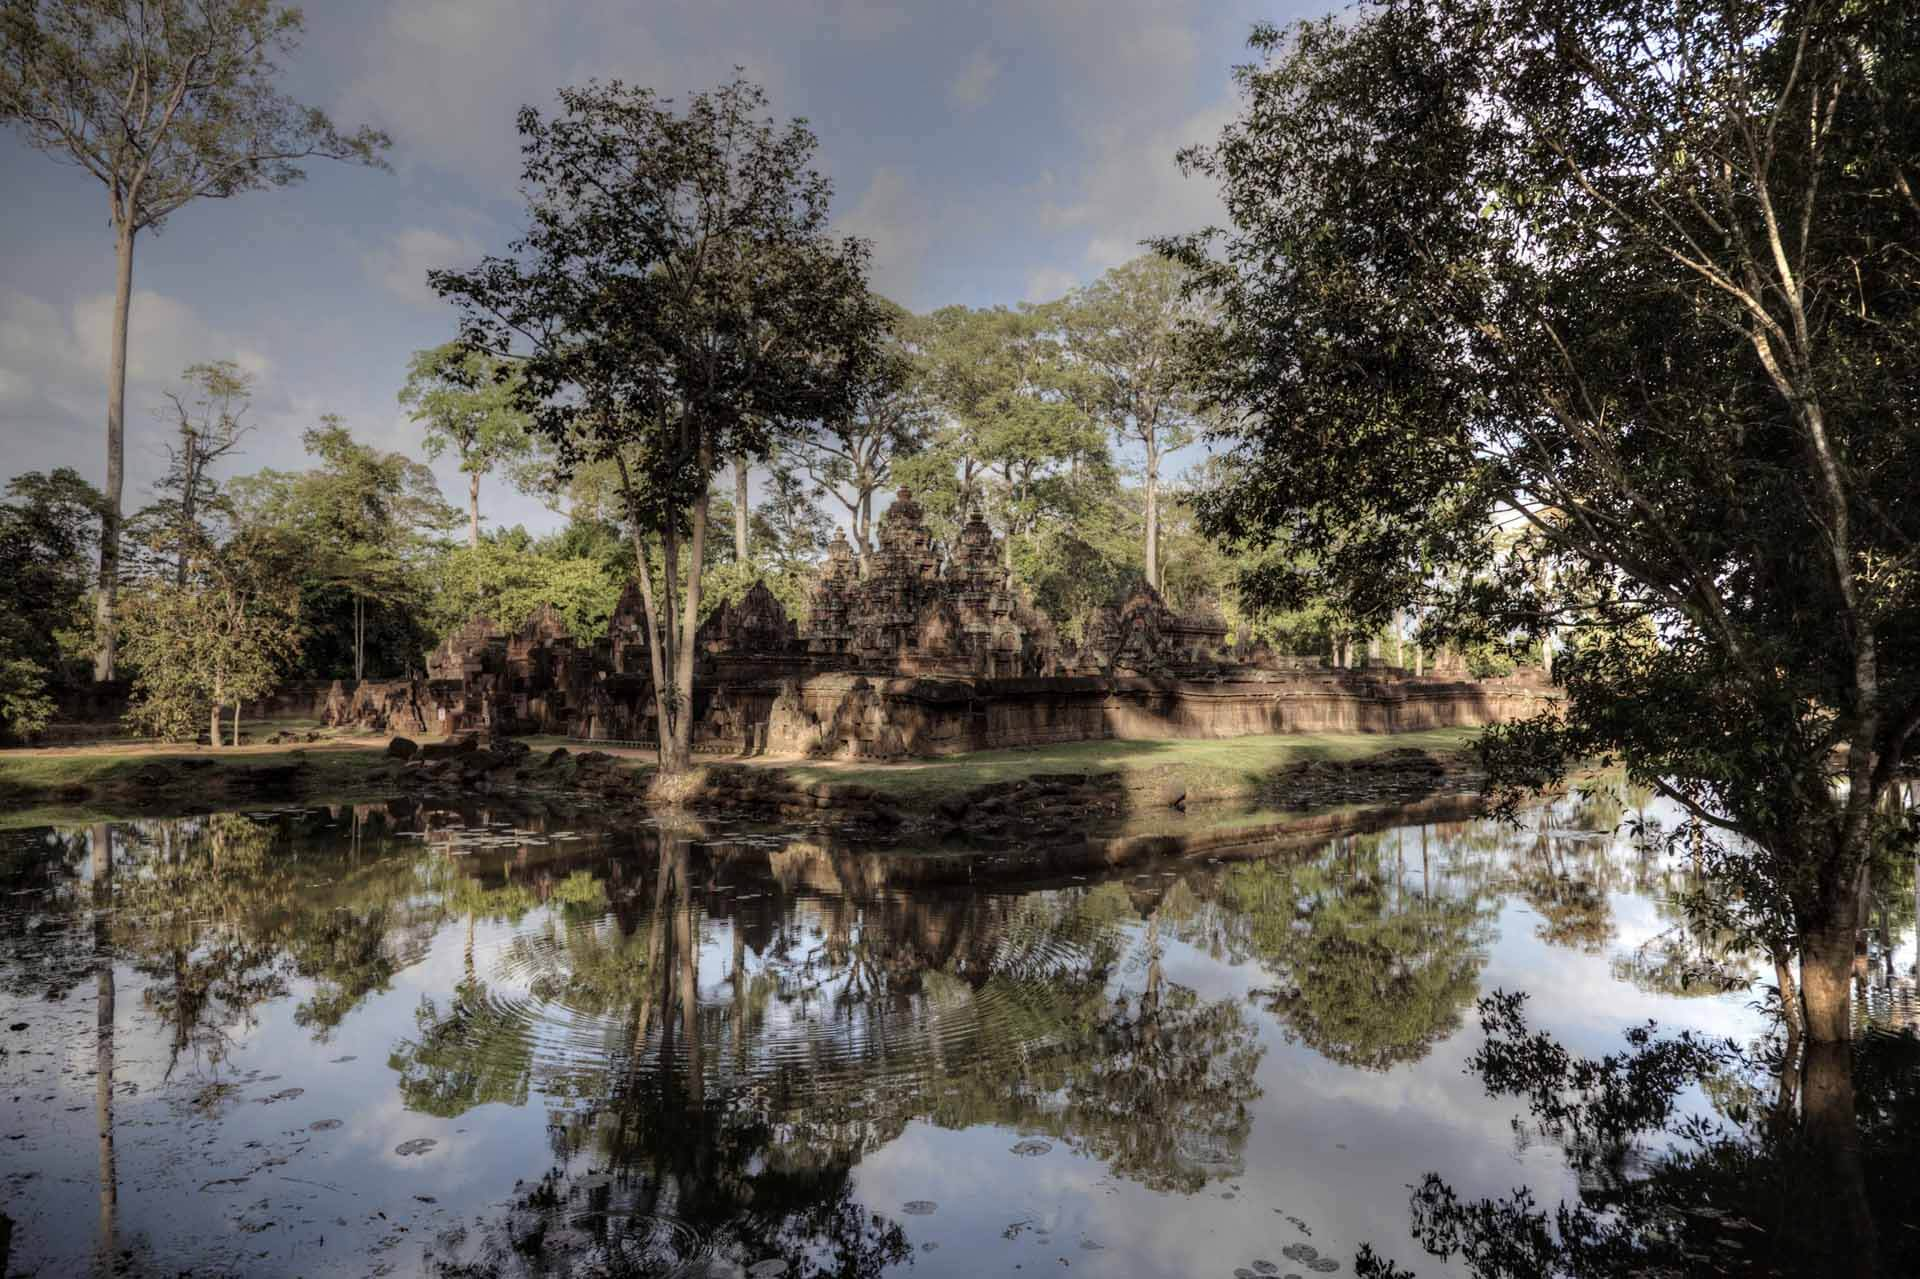 Kambodscha_Angkor_130